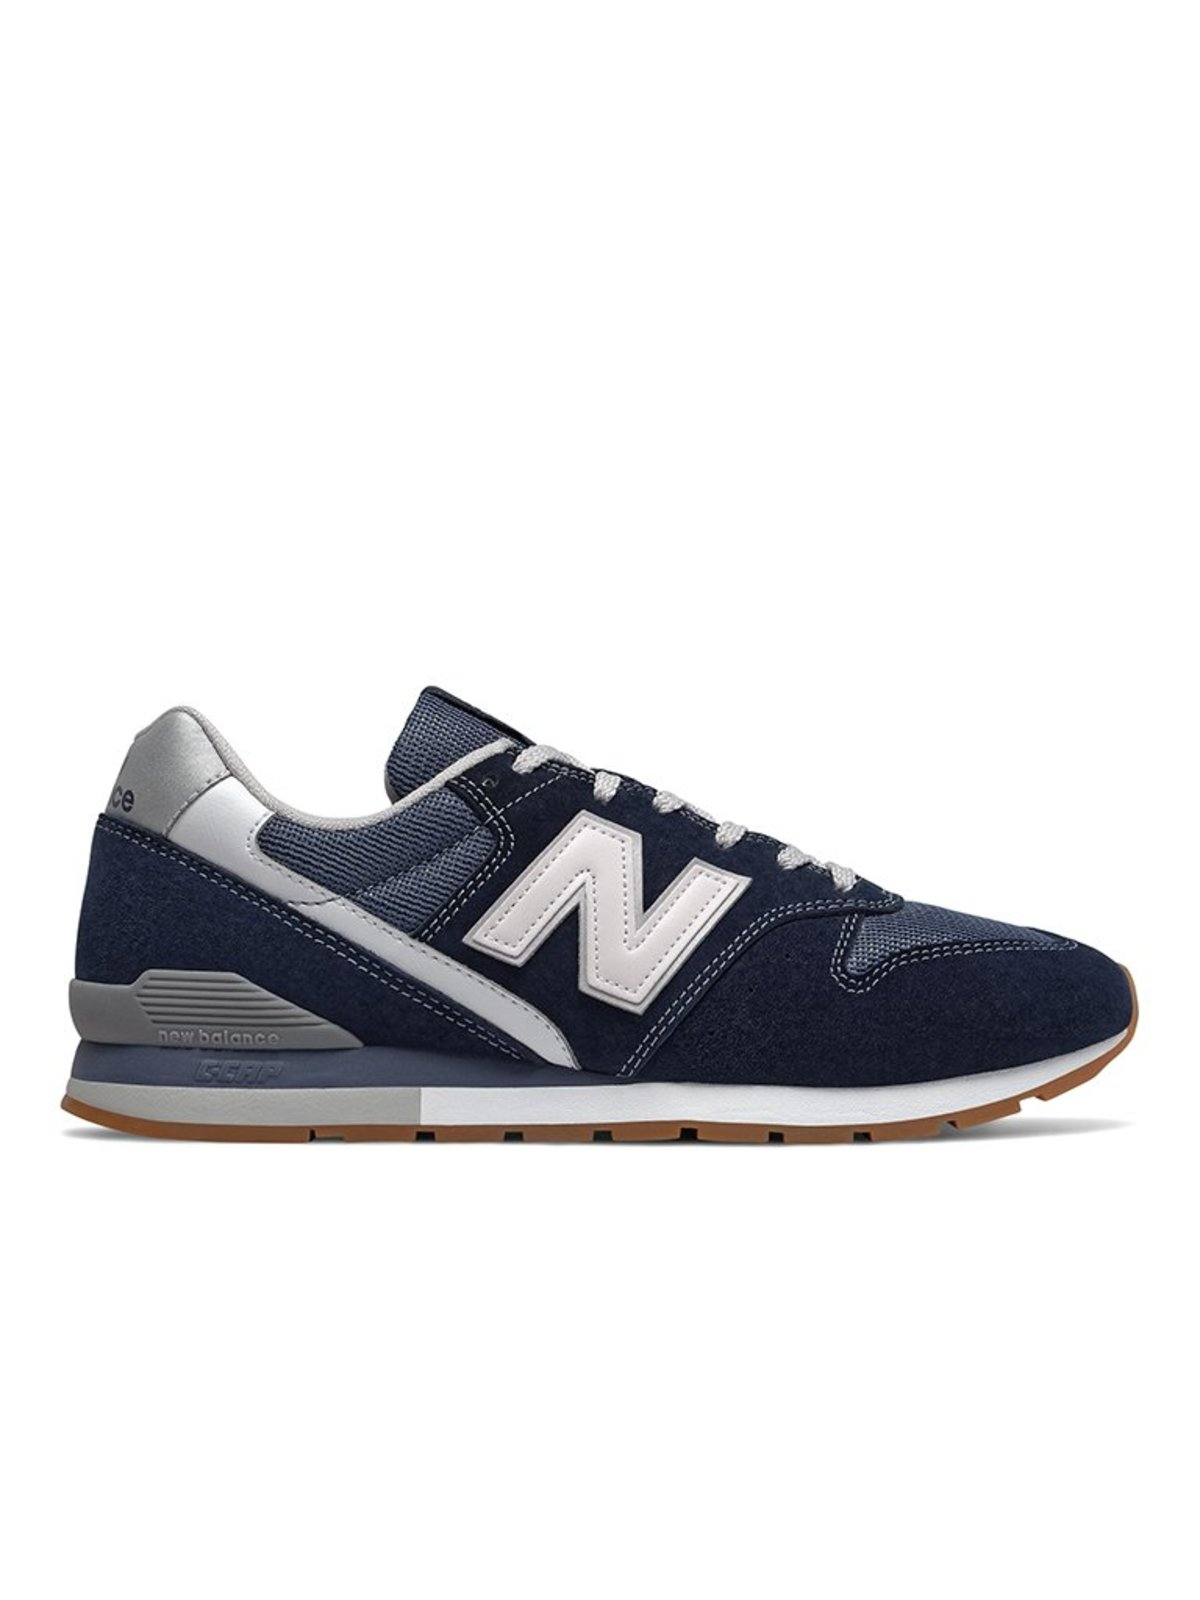 New Balance 996 Sneaker - Natural